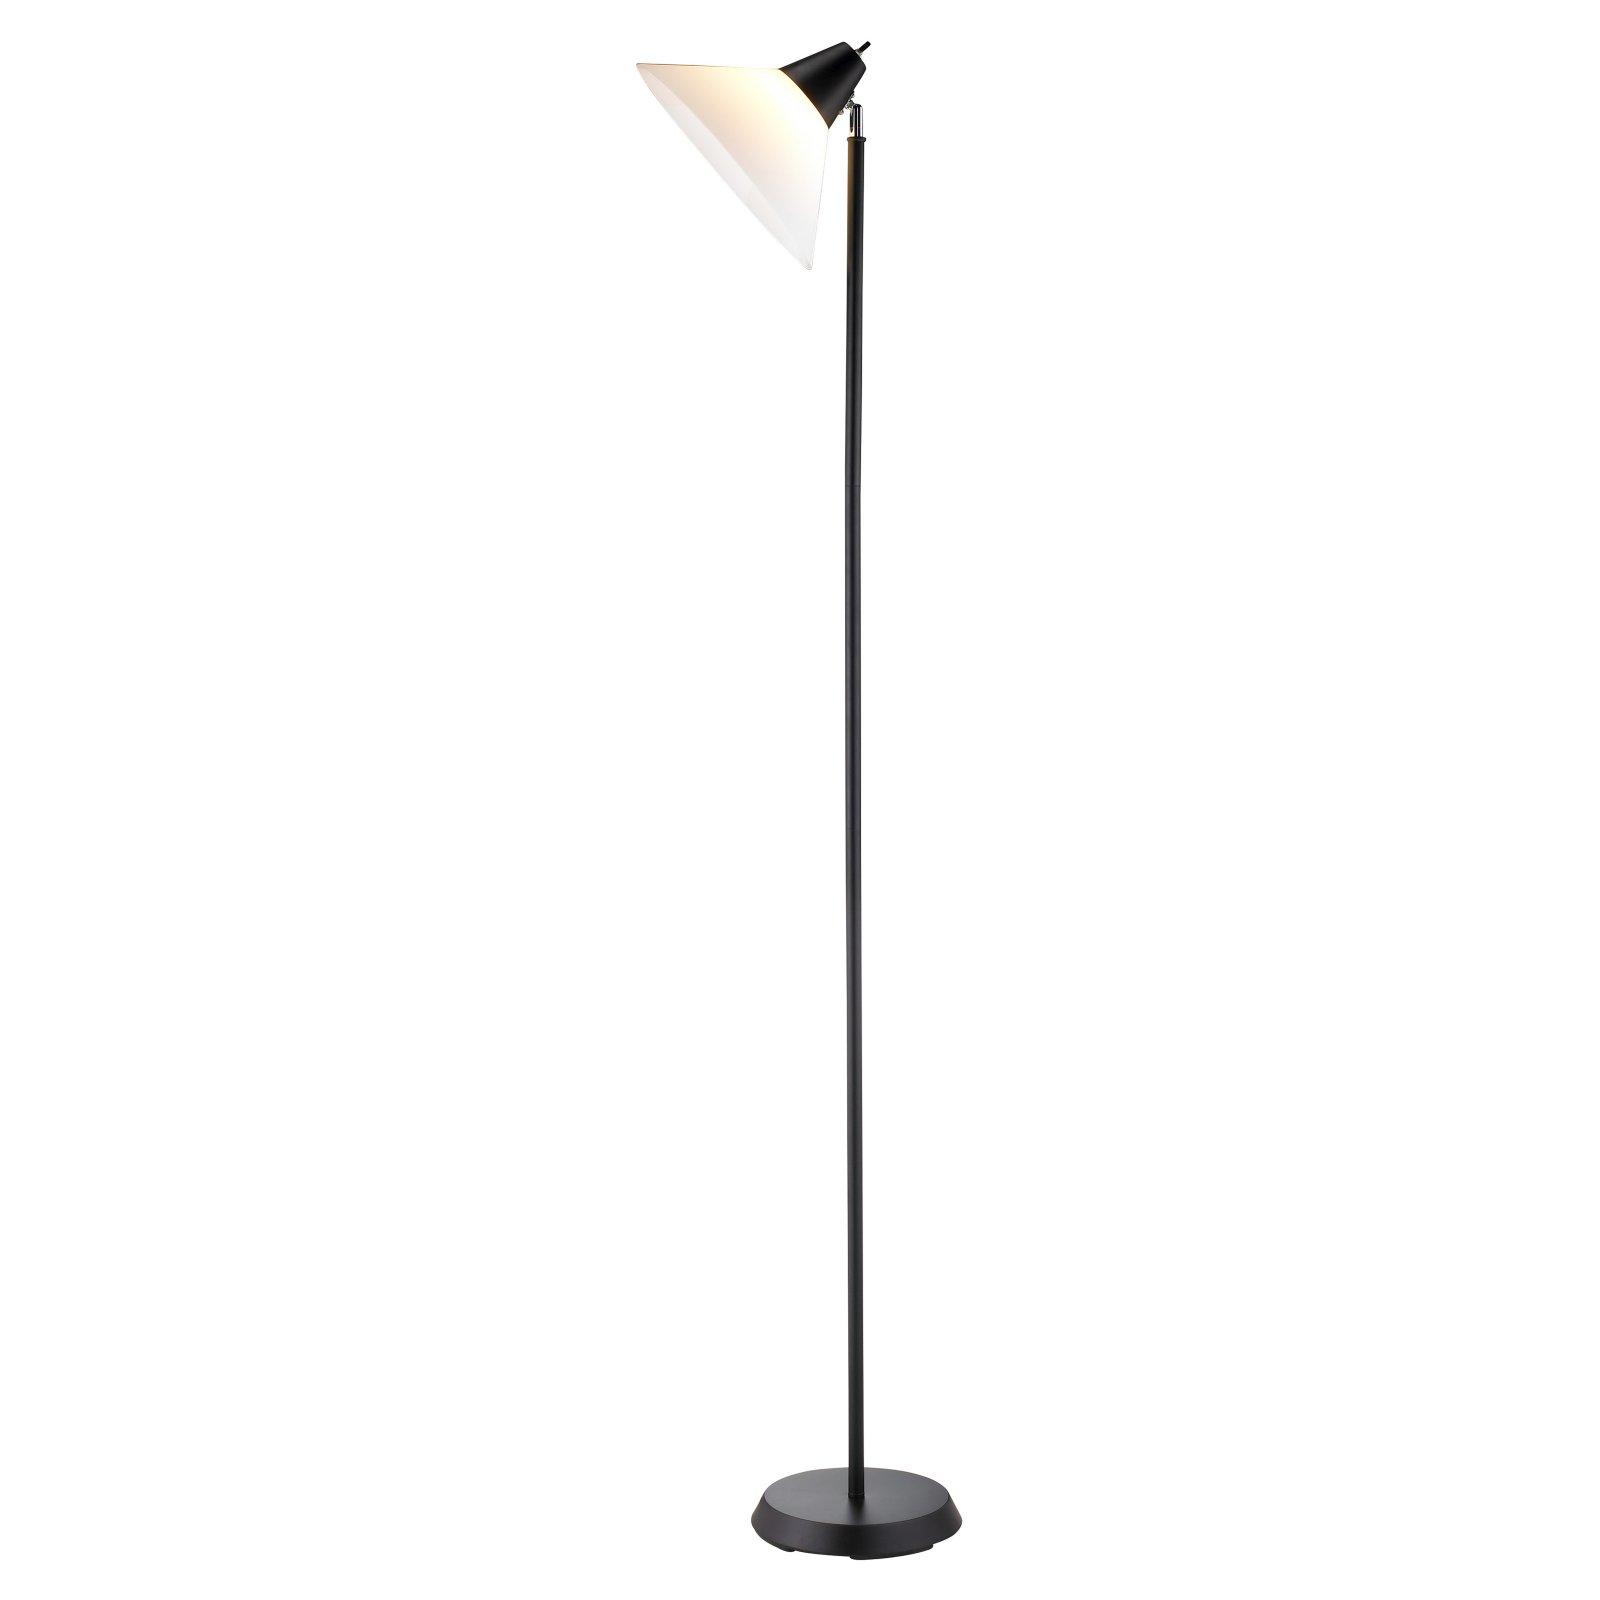 Adesso Swivel Floor Lamp by Adesso